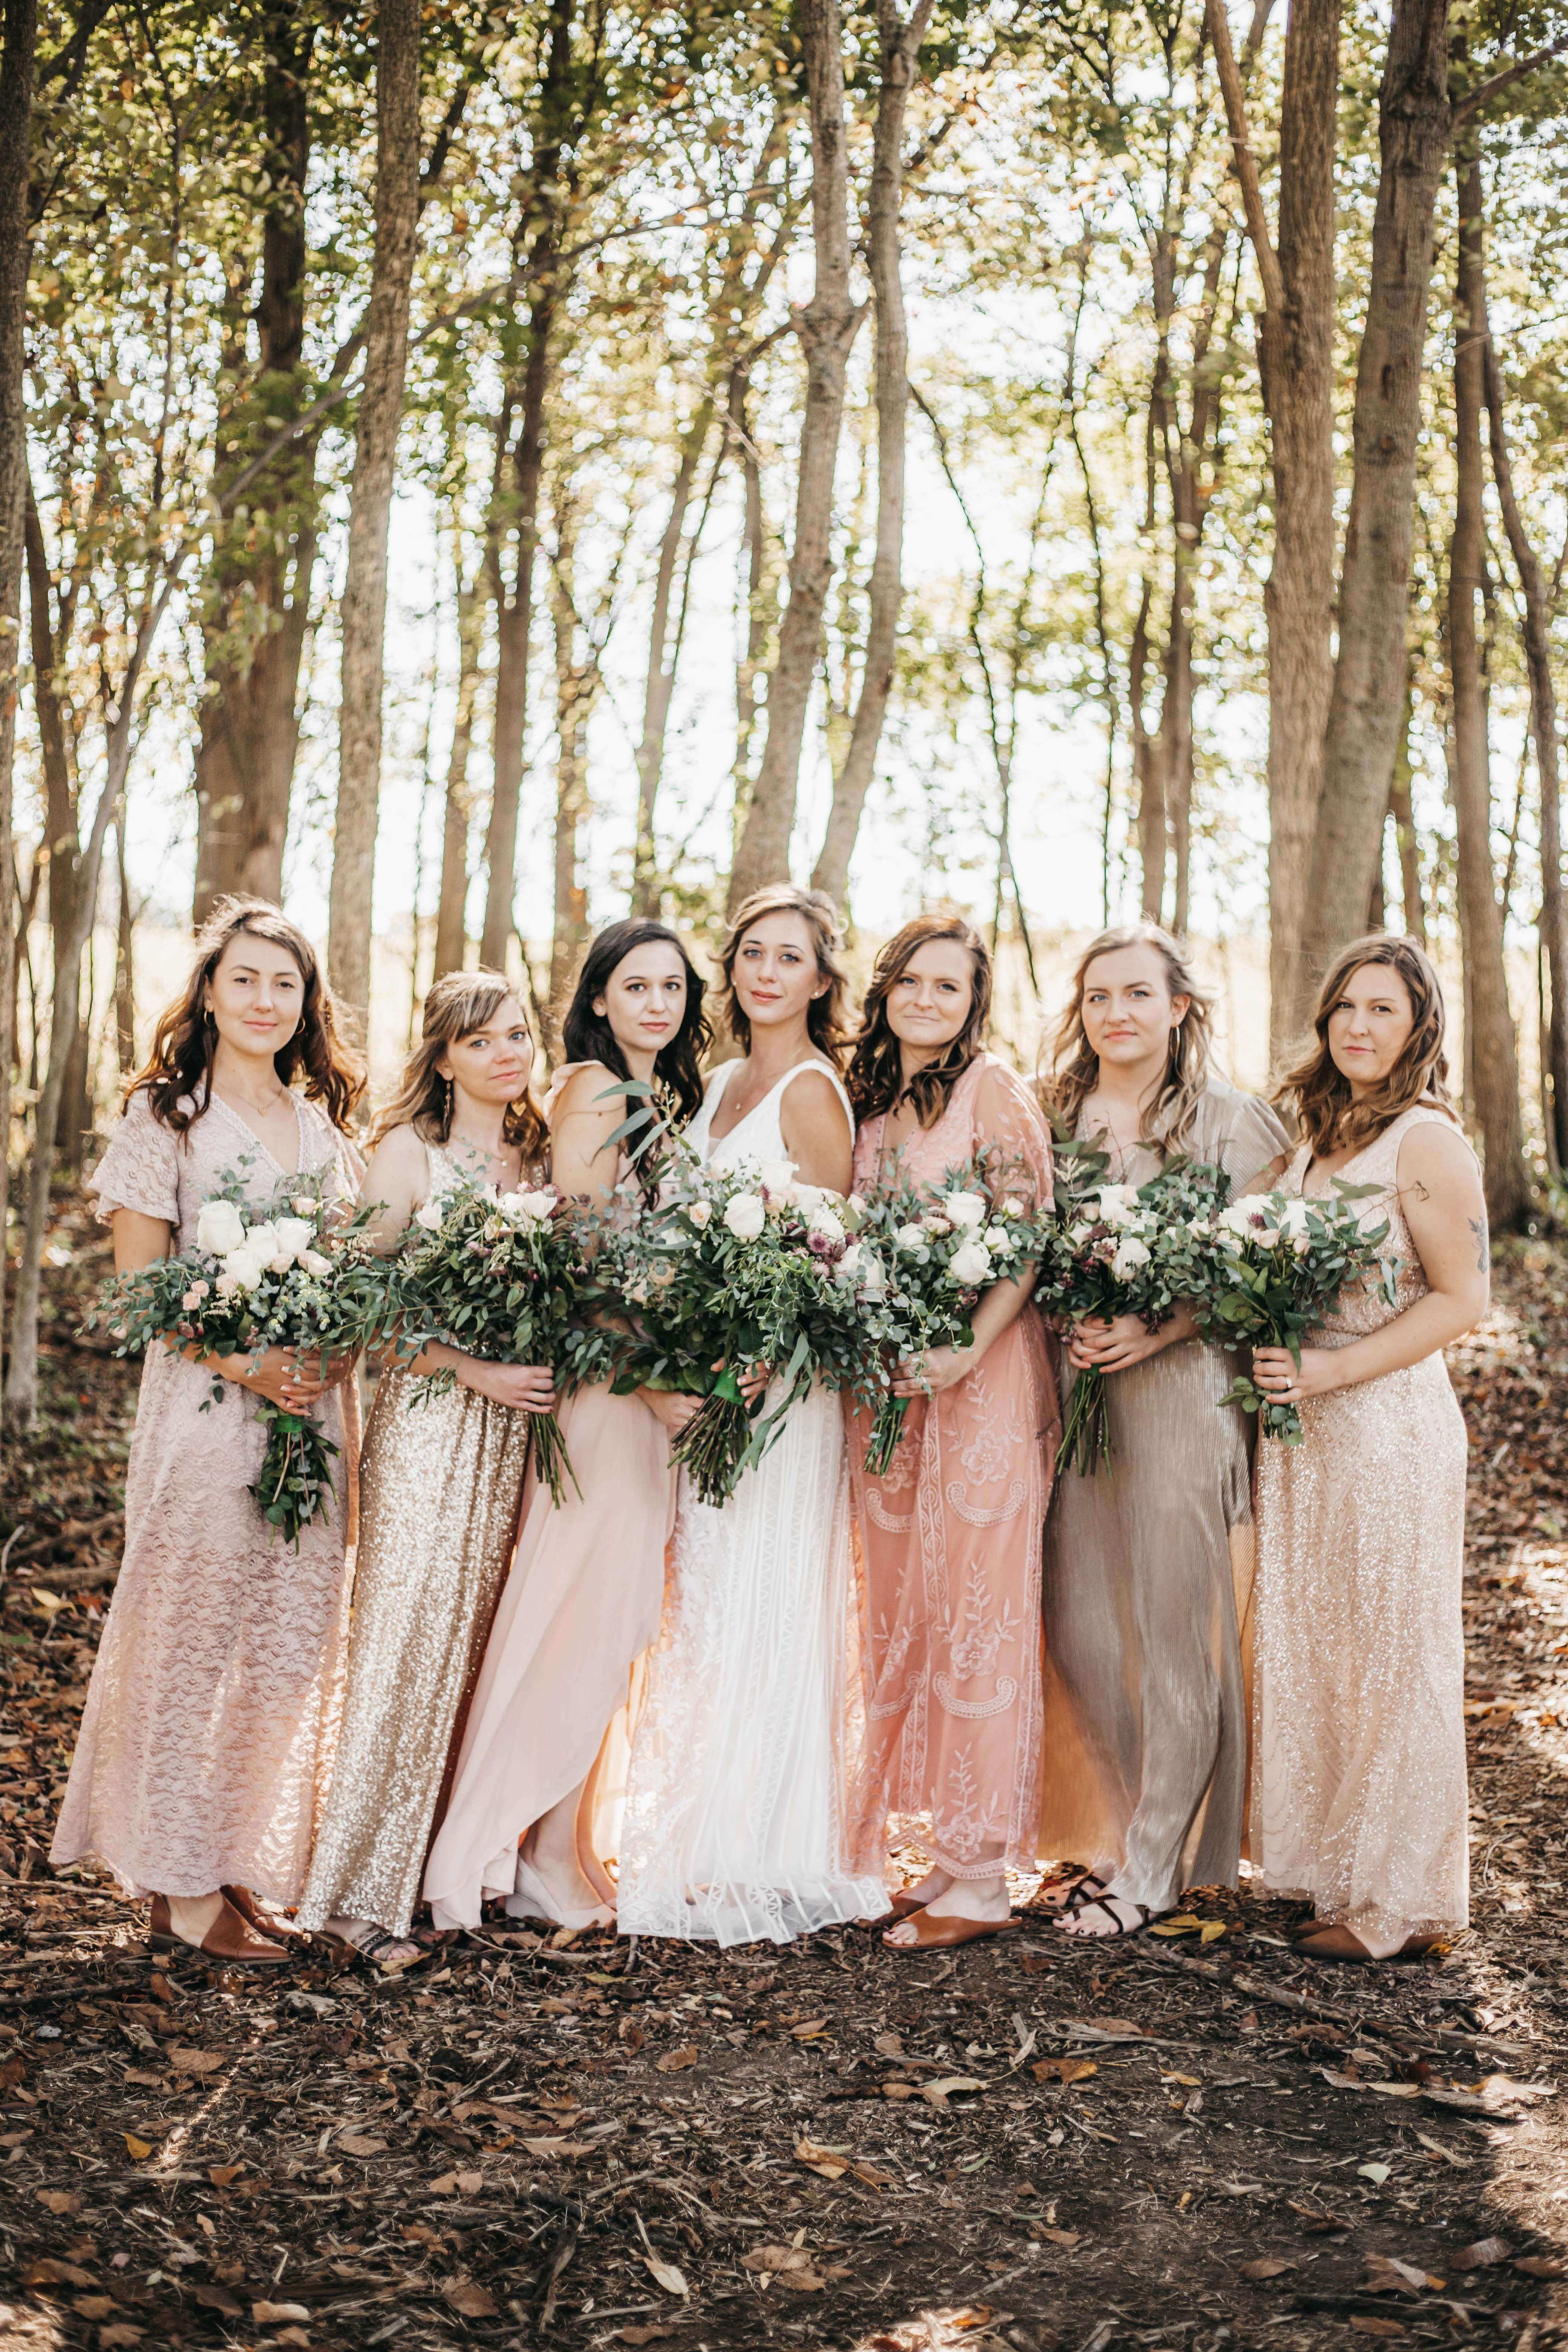 Woodsy Boho Bridesmaid Dress Ideas Coordinating Colors Wedding Gown Florals Inspiration Columbus Bridesmaid Dresses Boho Ohio Wedding Photographer Ohio Wedding